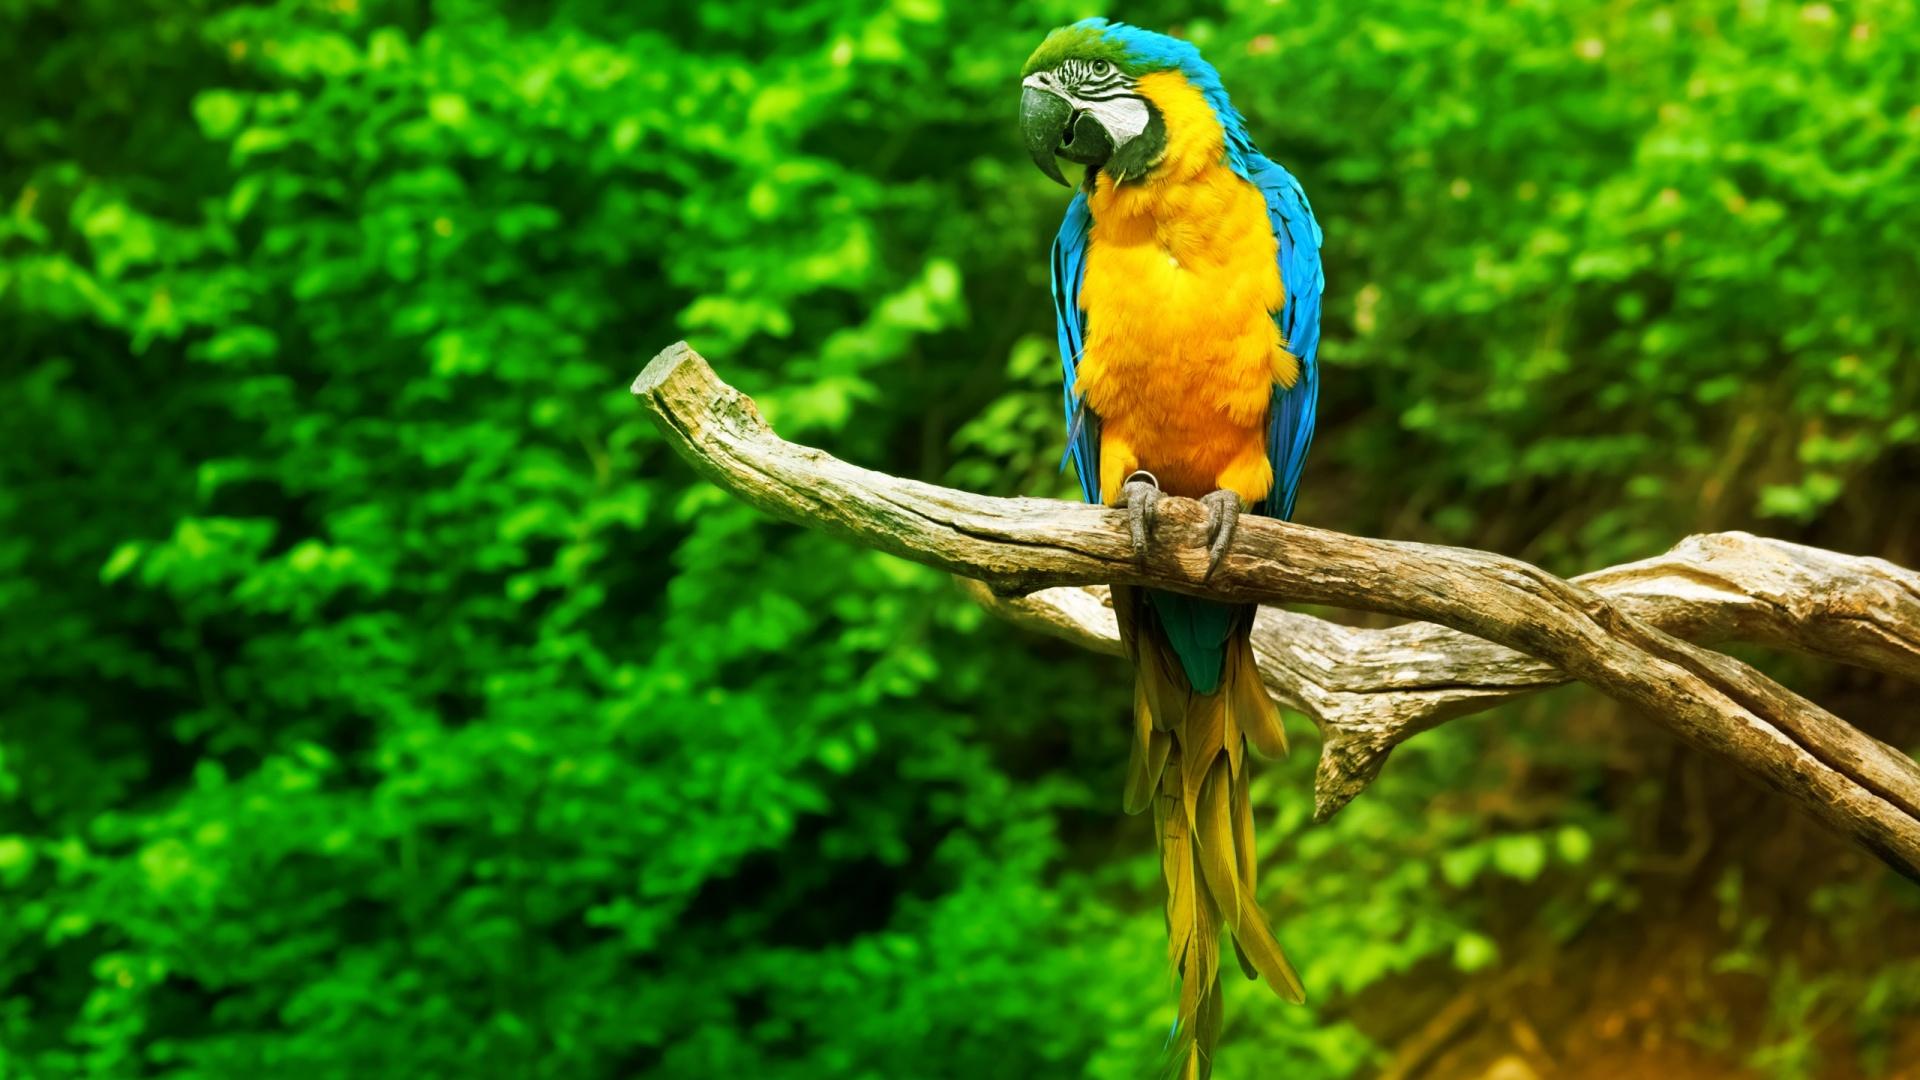 Beautiful-Parrot-1920-x-1080-wallpaper-wp3403024